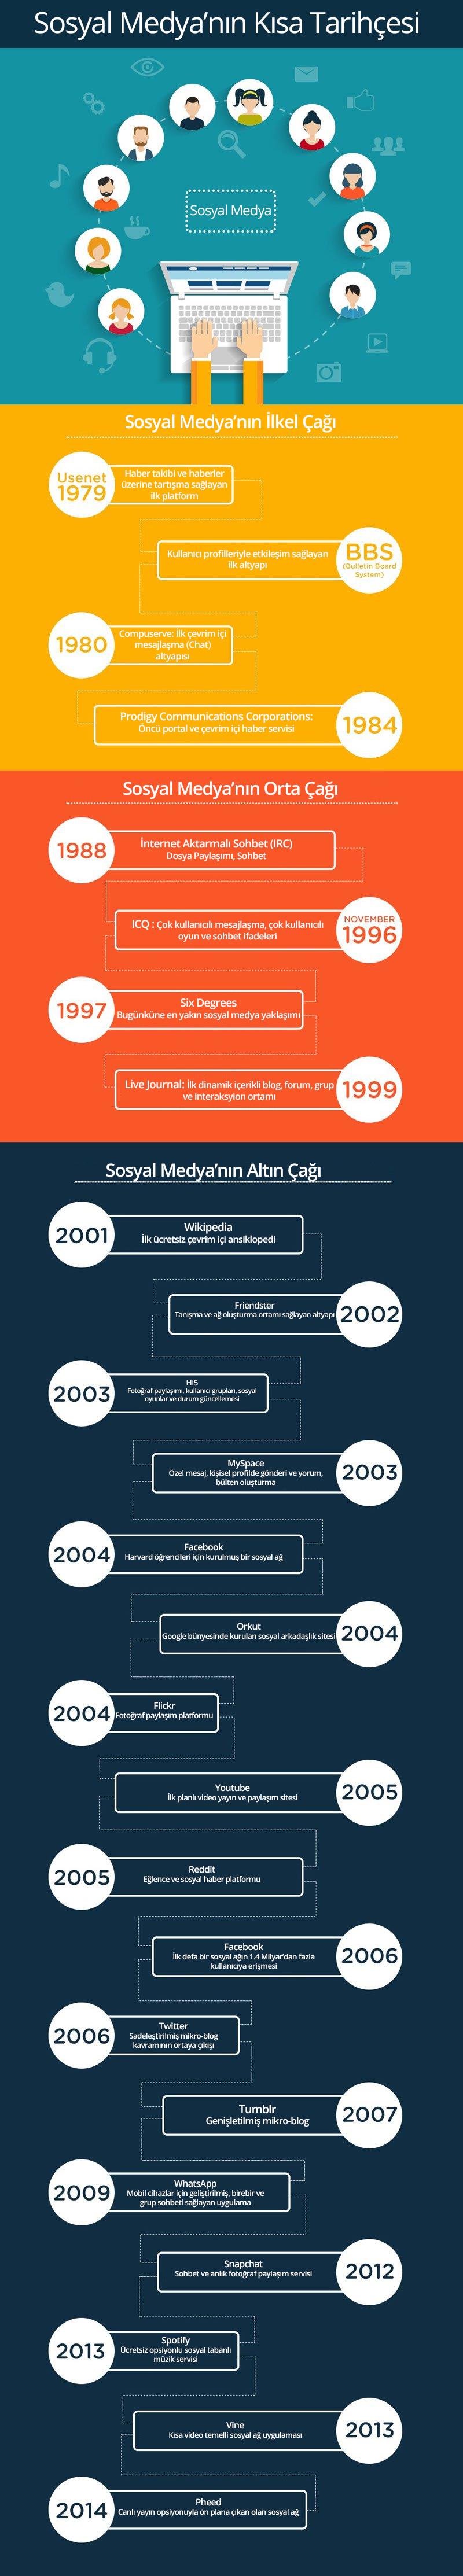 sosyal-medyanin-kisa-tarihi-